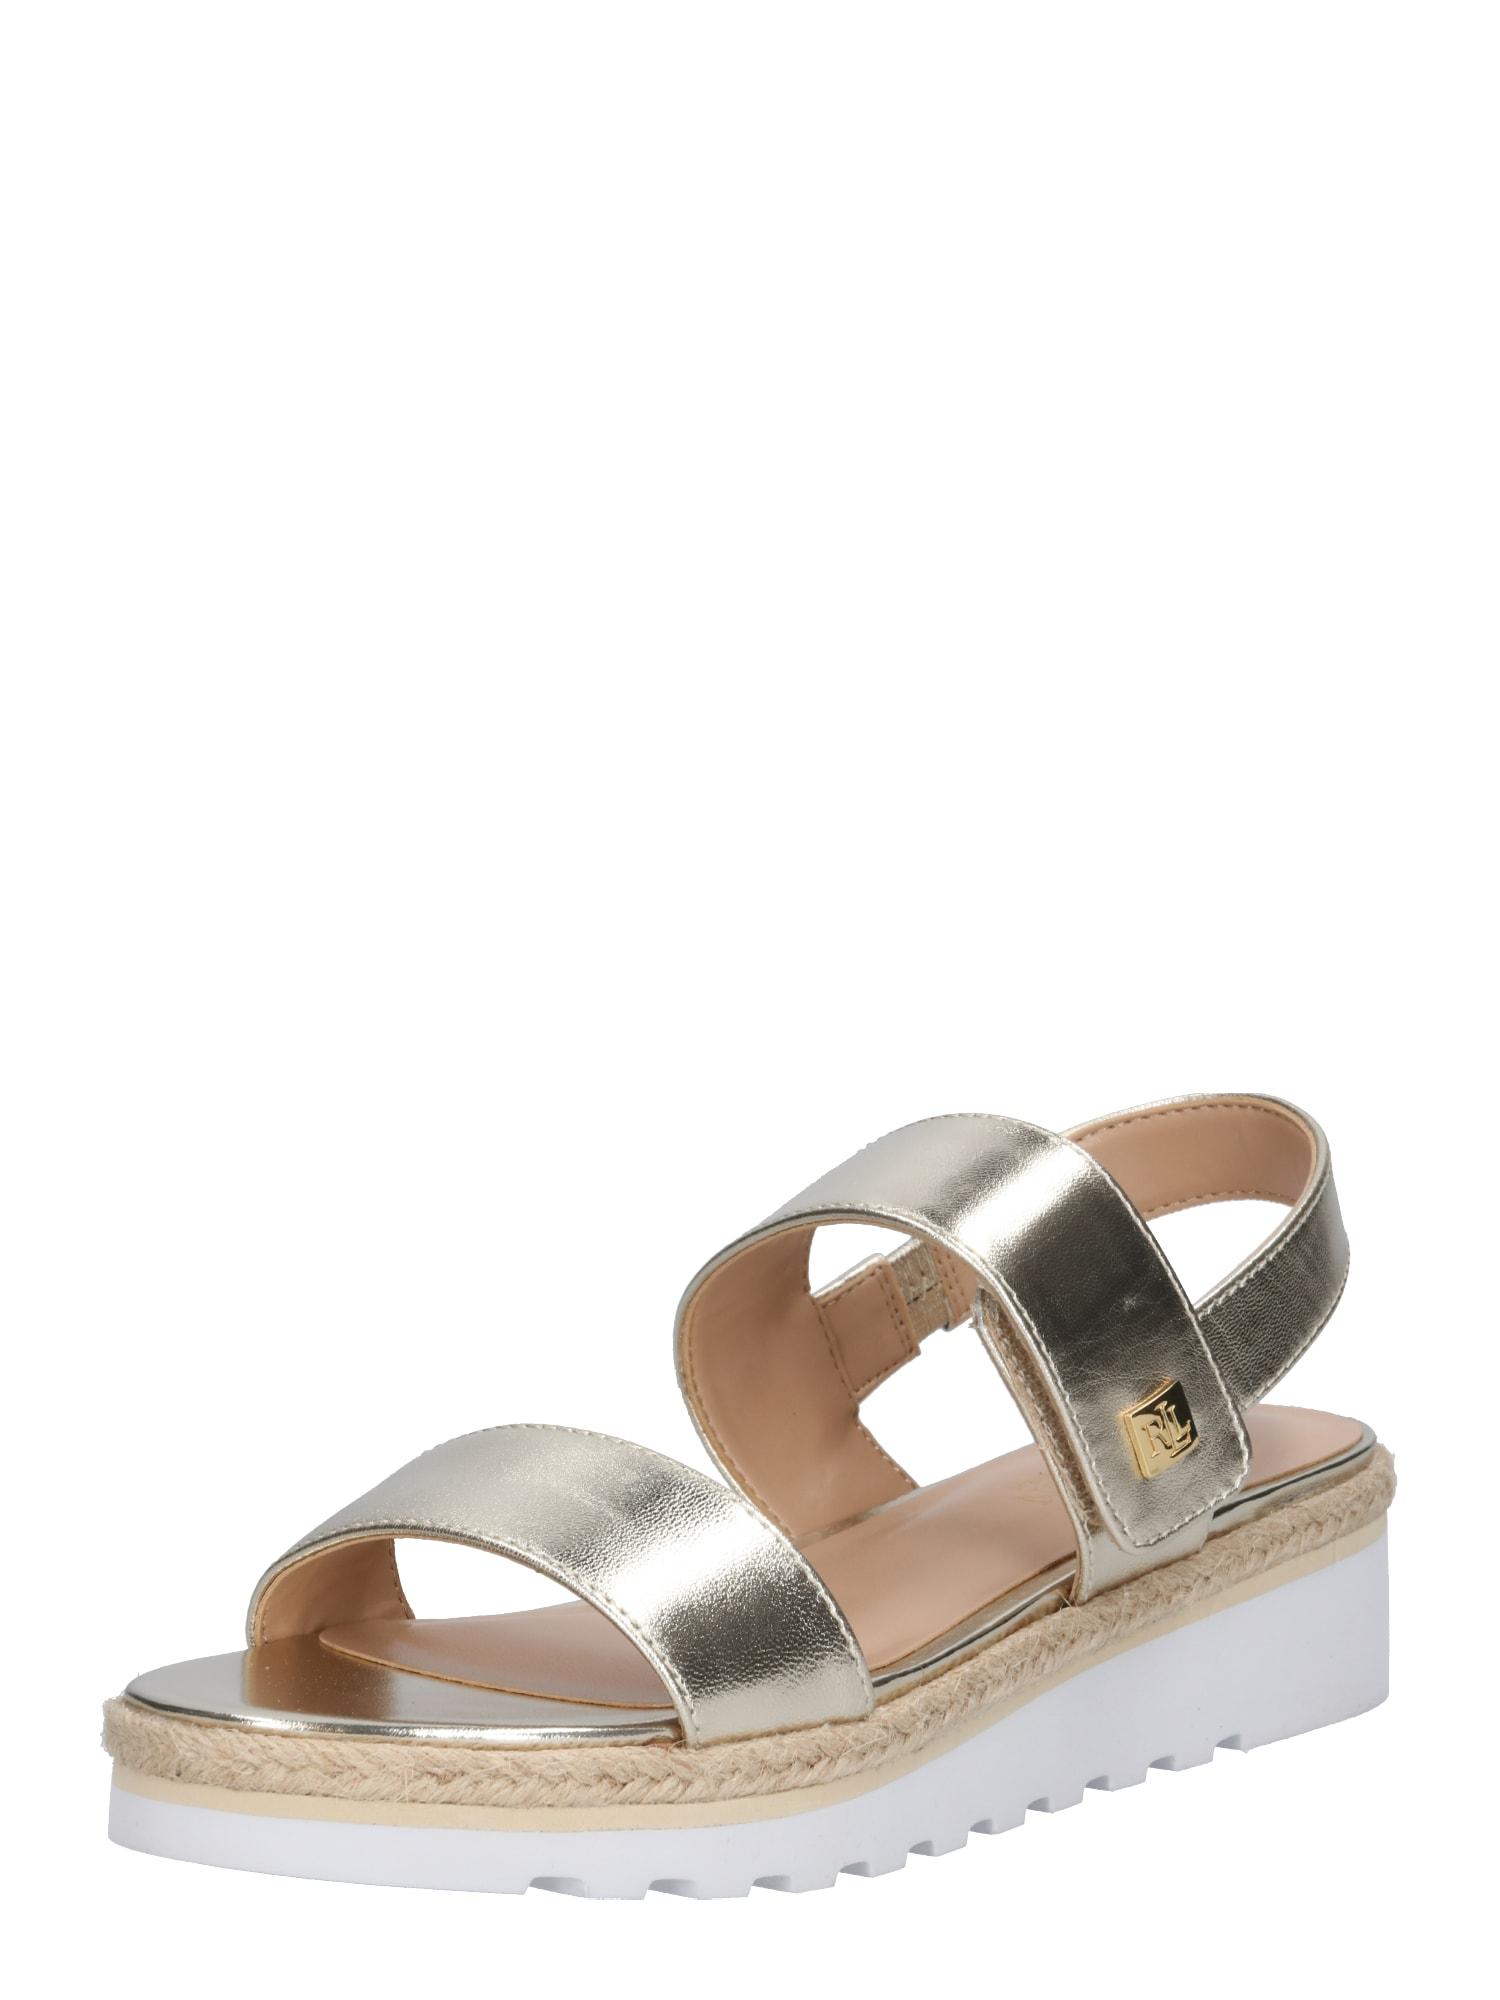 Sandály JEWELLE stříbrná Lauren Ralph Lauren